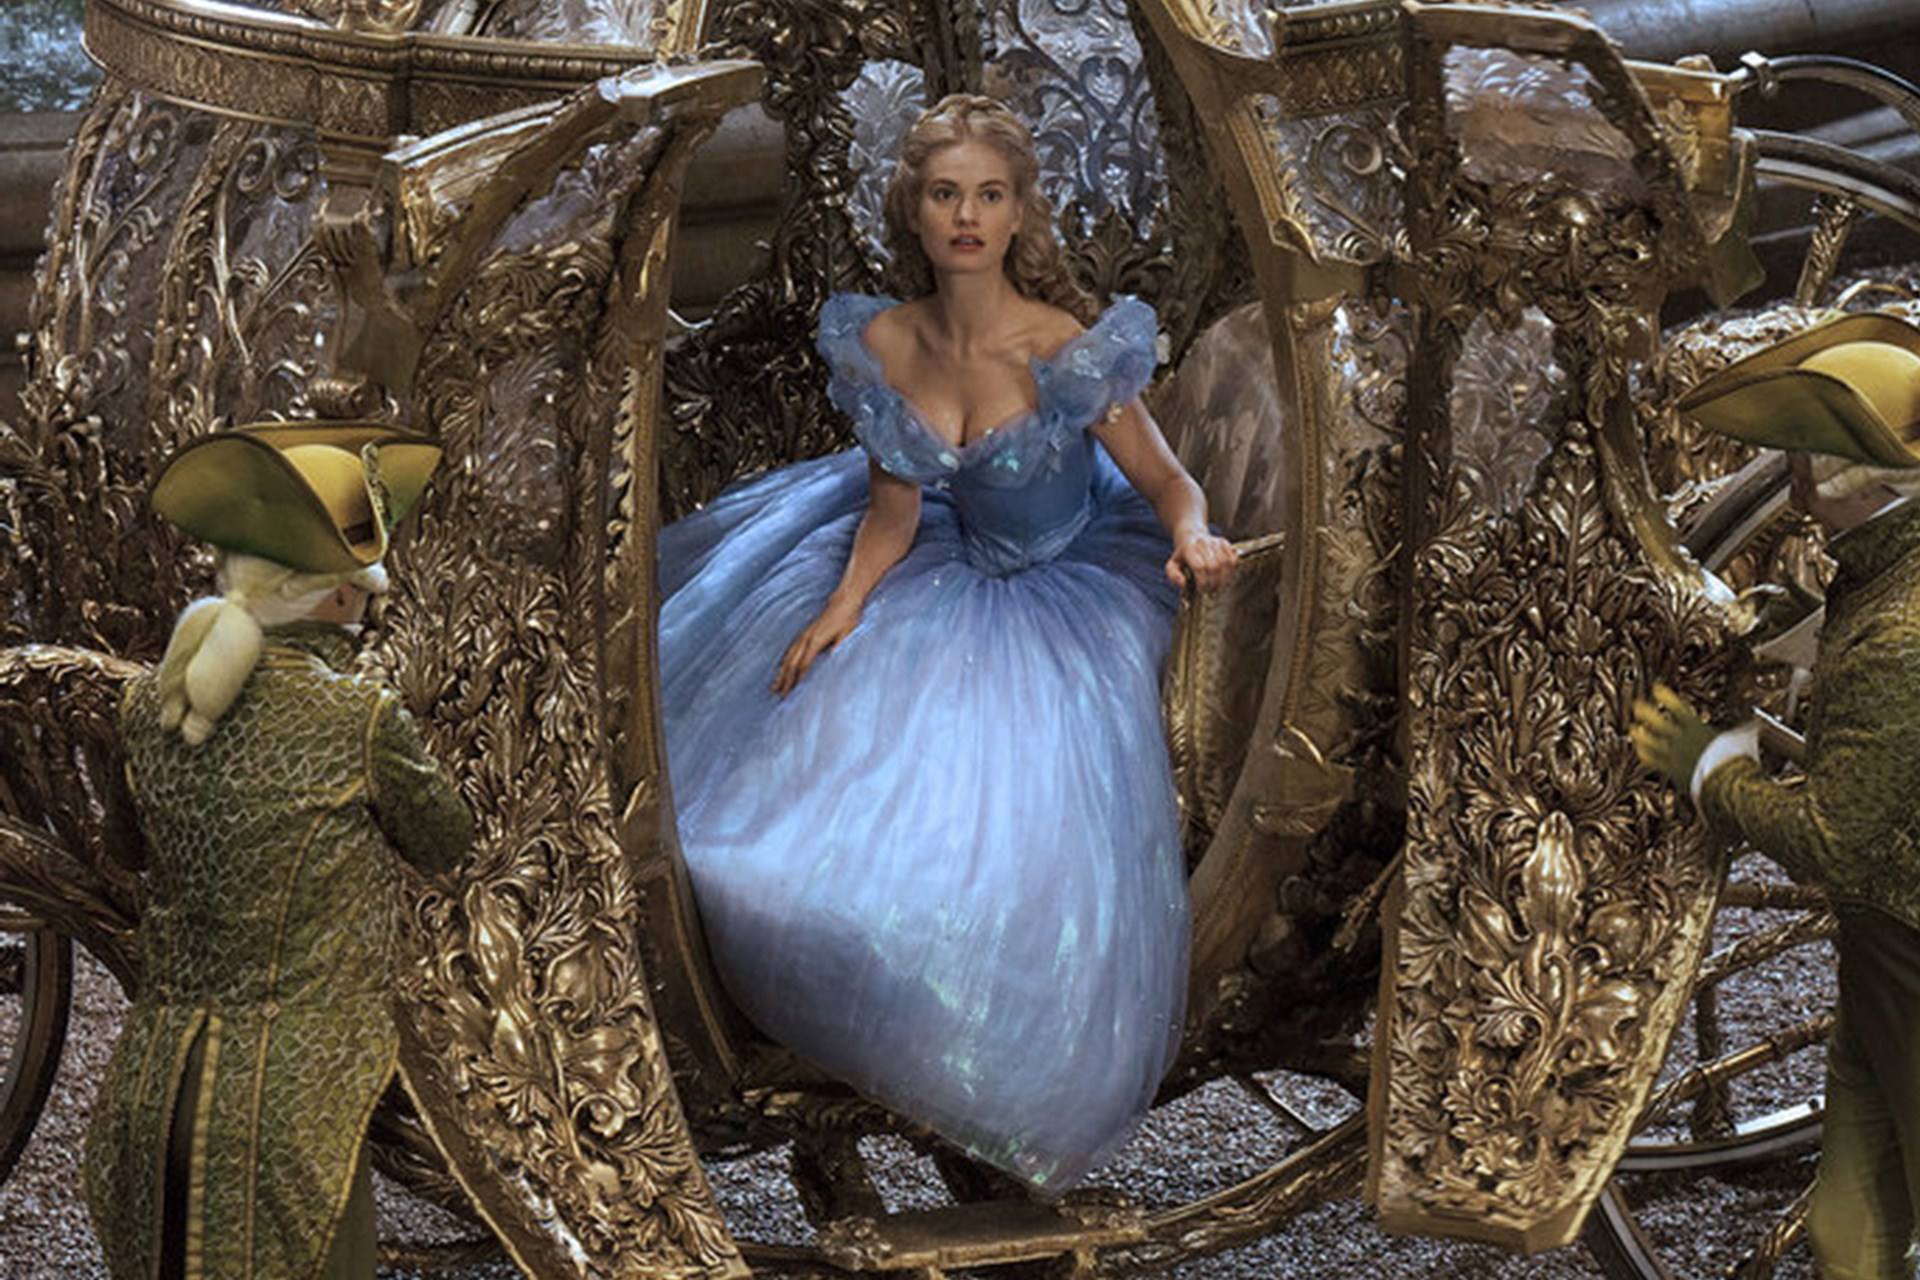 Cinderella - Cinderella (2015) Photo (38086567) - Fanpop Helena Bonham Carter Facebook